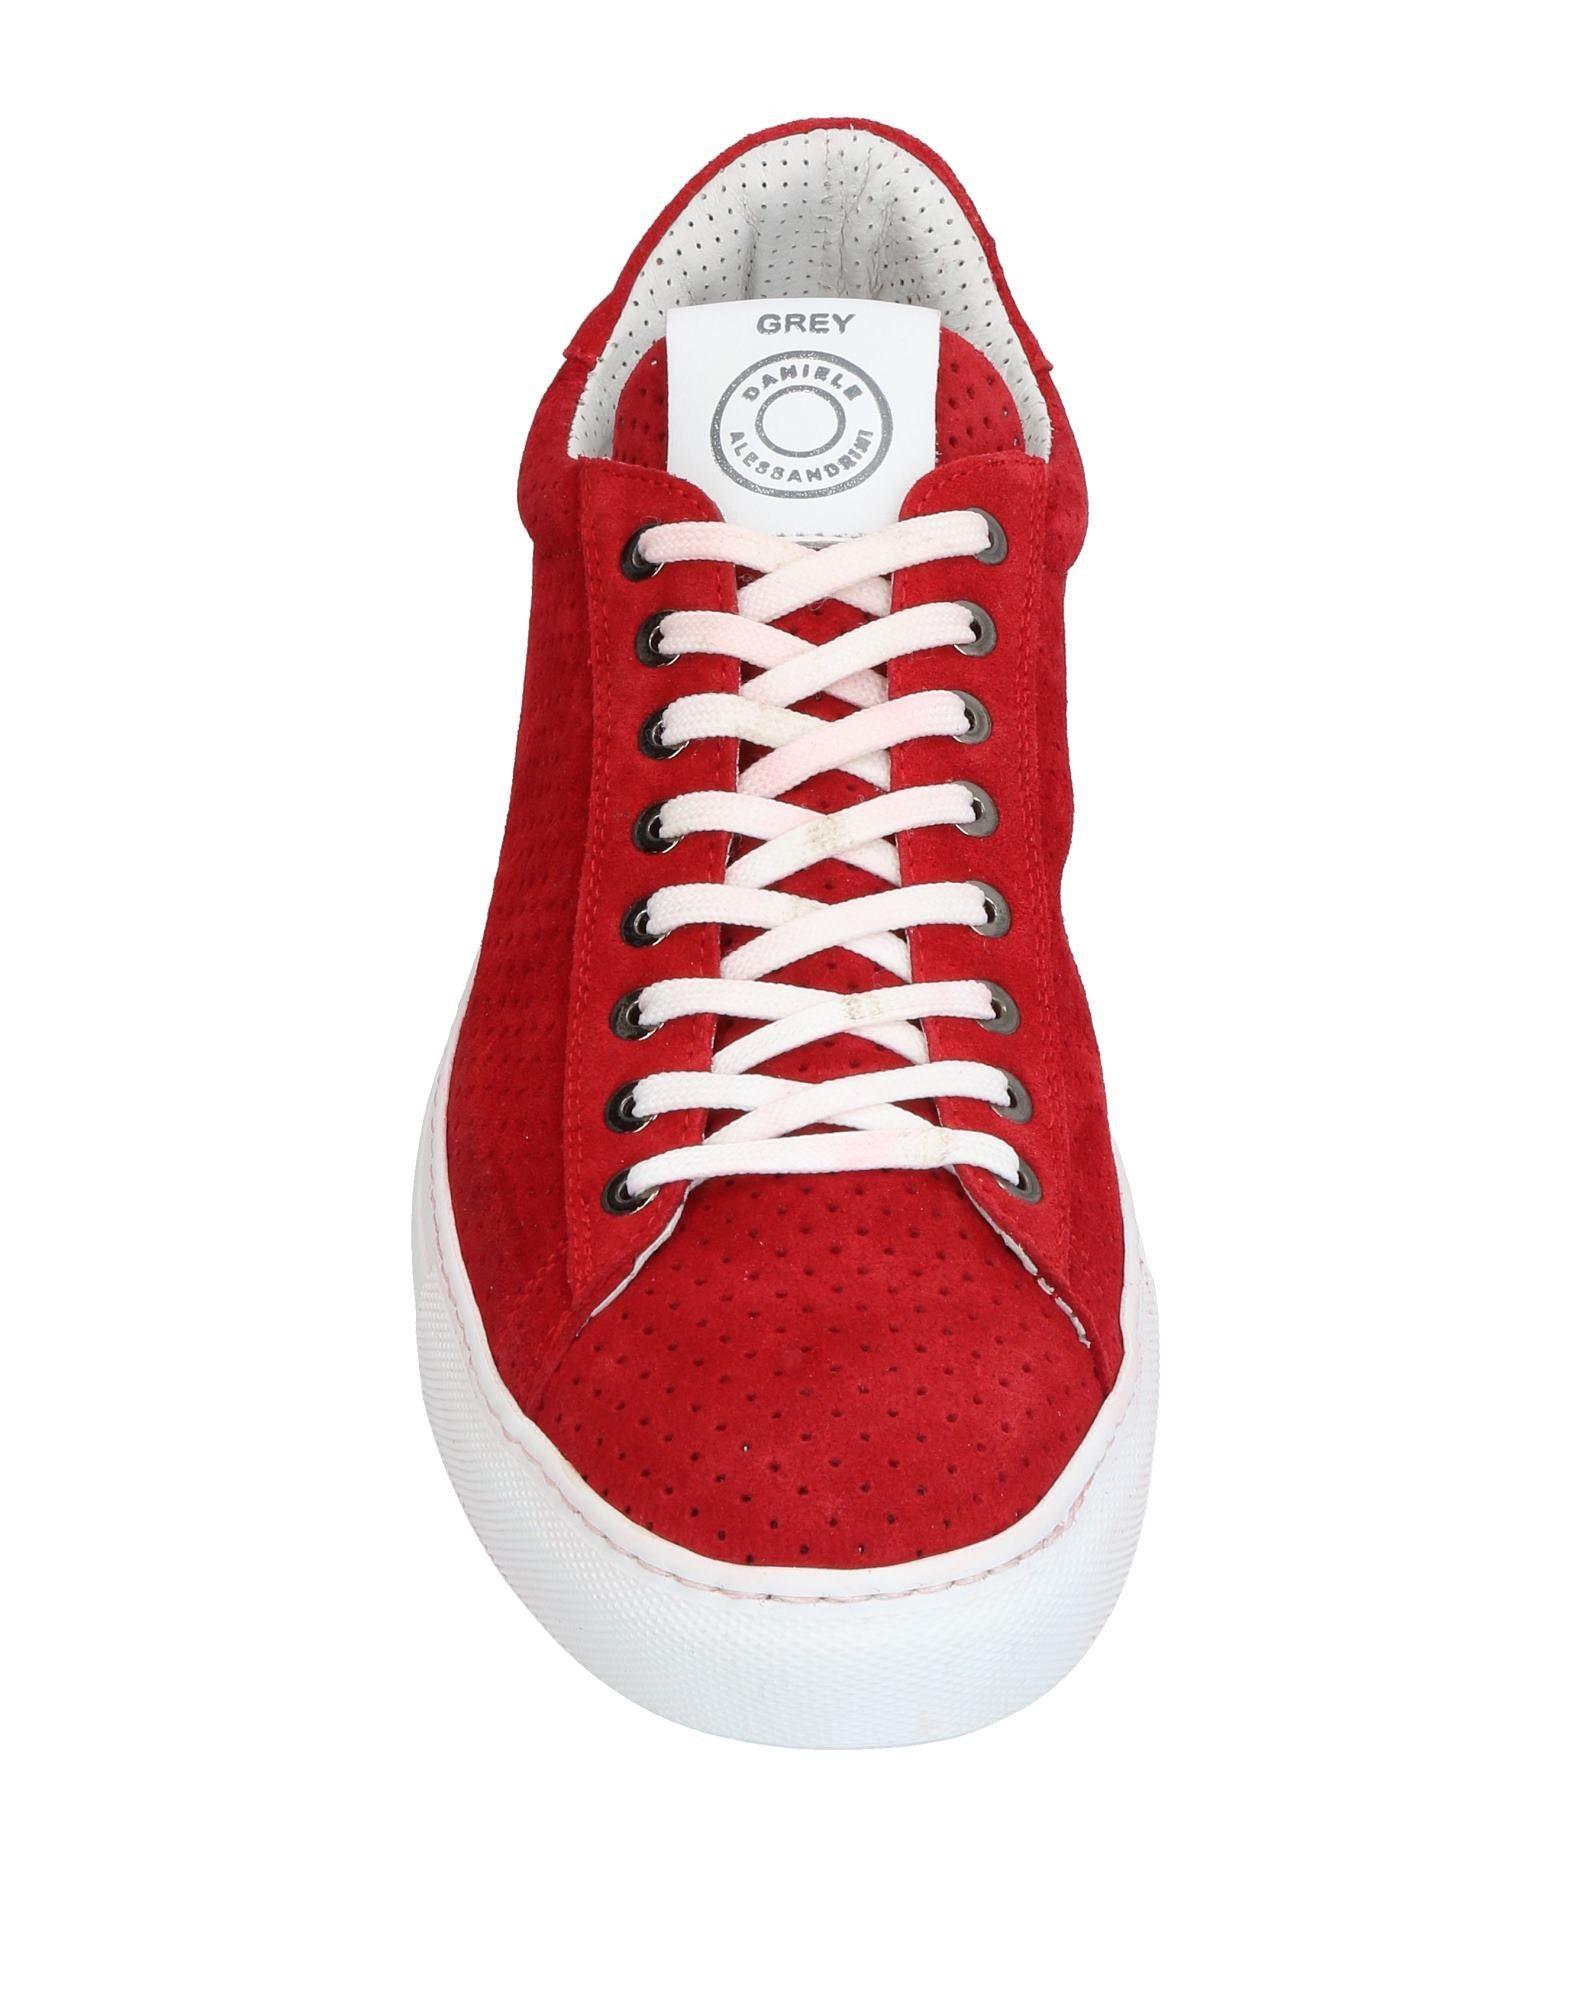 Sneakers Grey Daniele Alessandrini Homme - Sneakers Grey Daniele Alessandrini sur